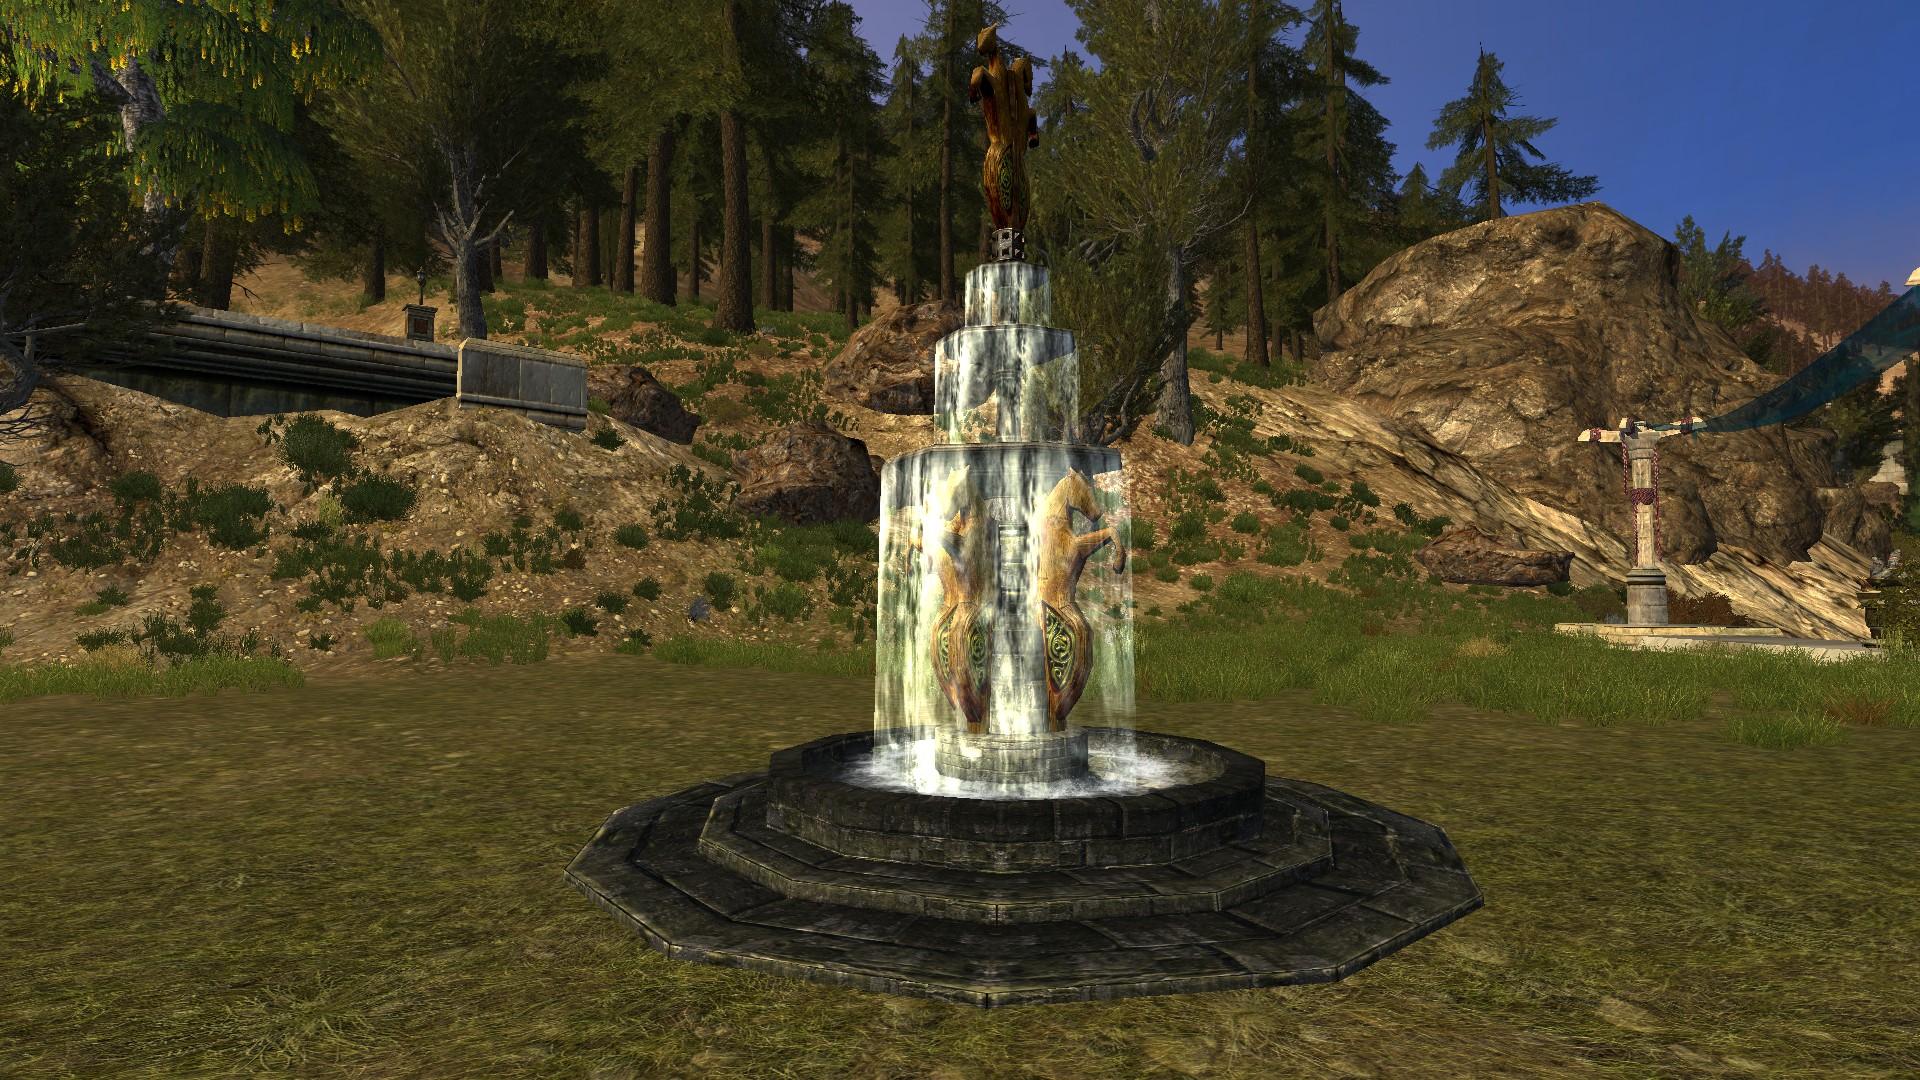 Fontaine du Rohan